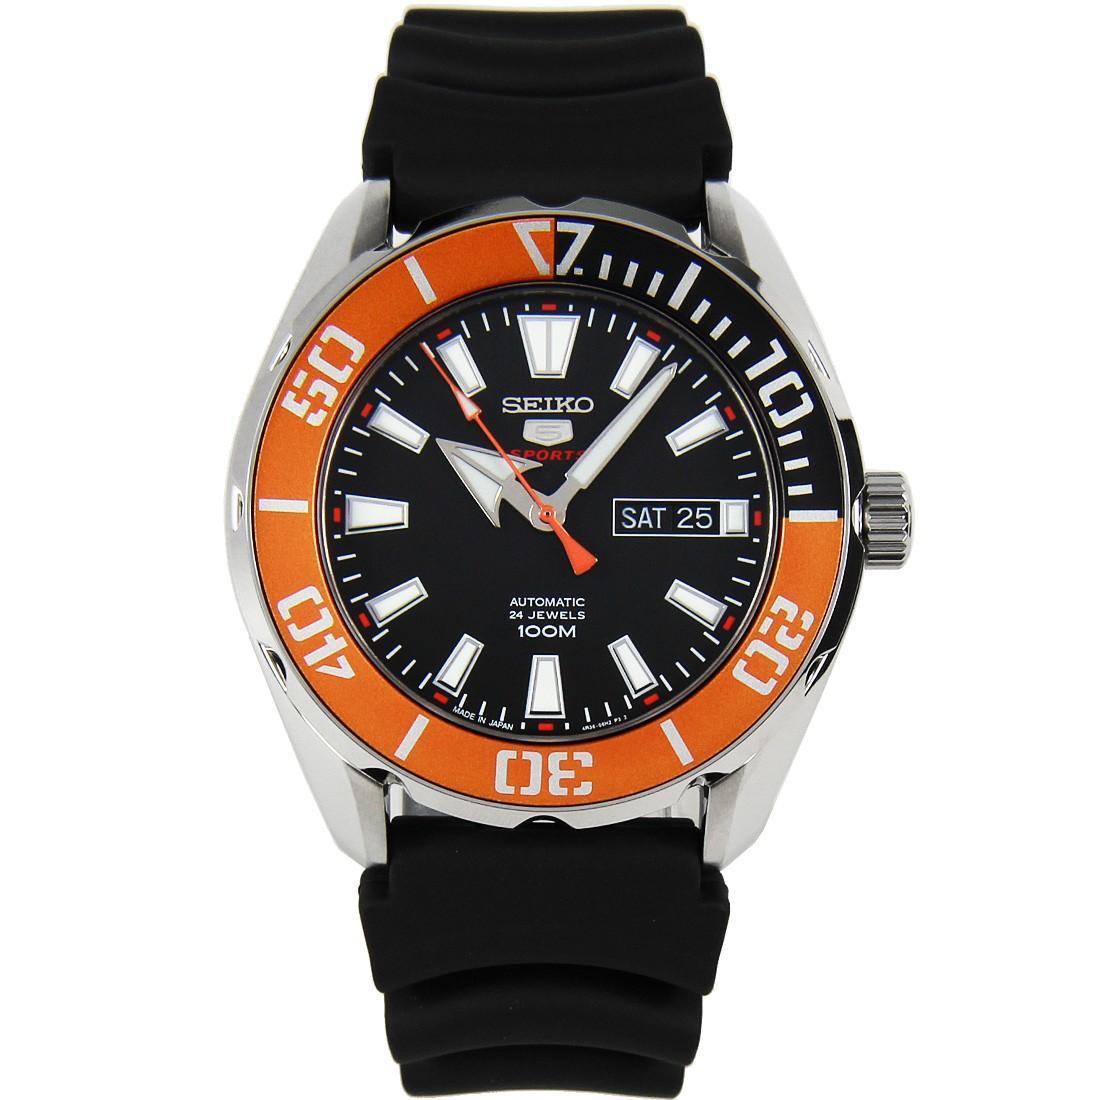 Seiko 5 Sports SRPC59 SRPC59J1 SRPC59J Automatic Orange Black Bezel Japan Watch